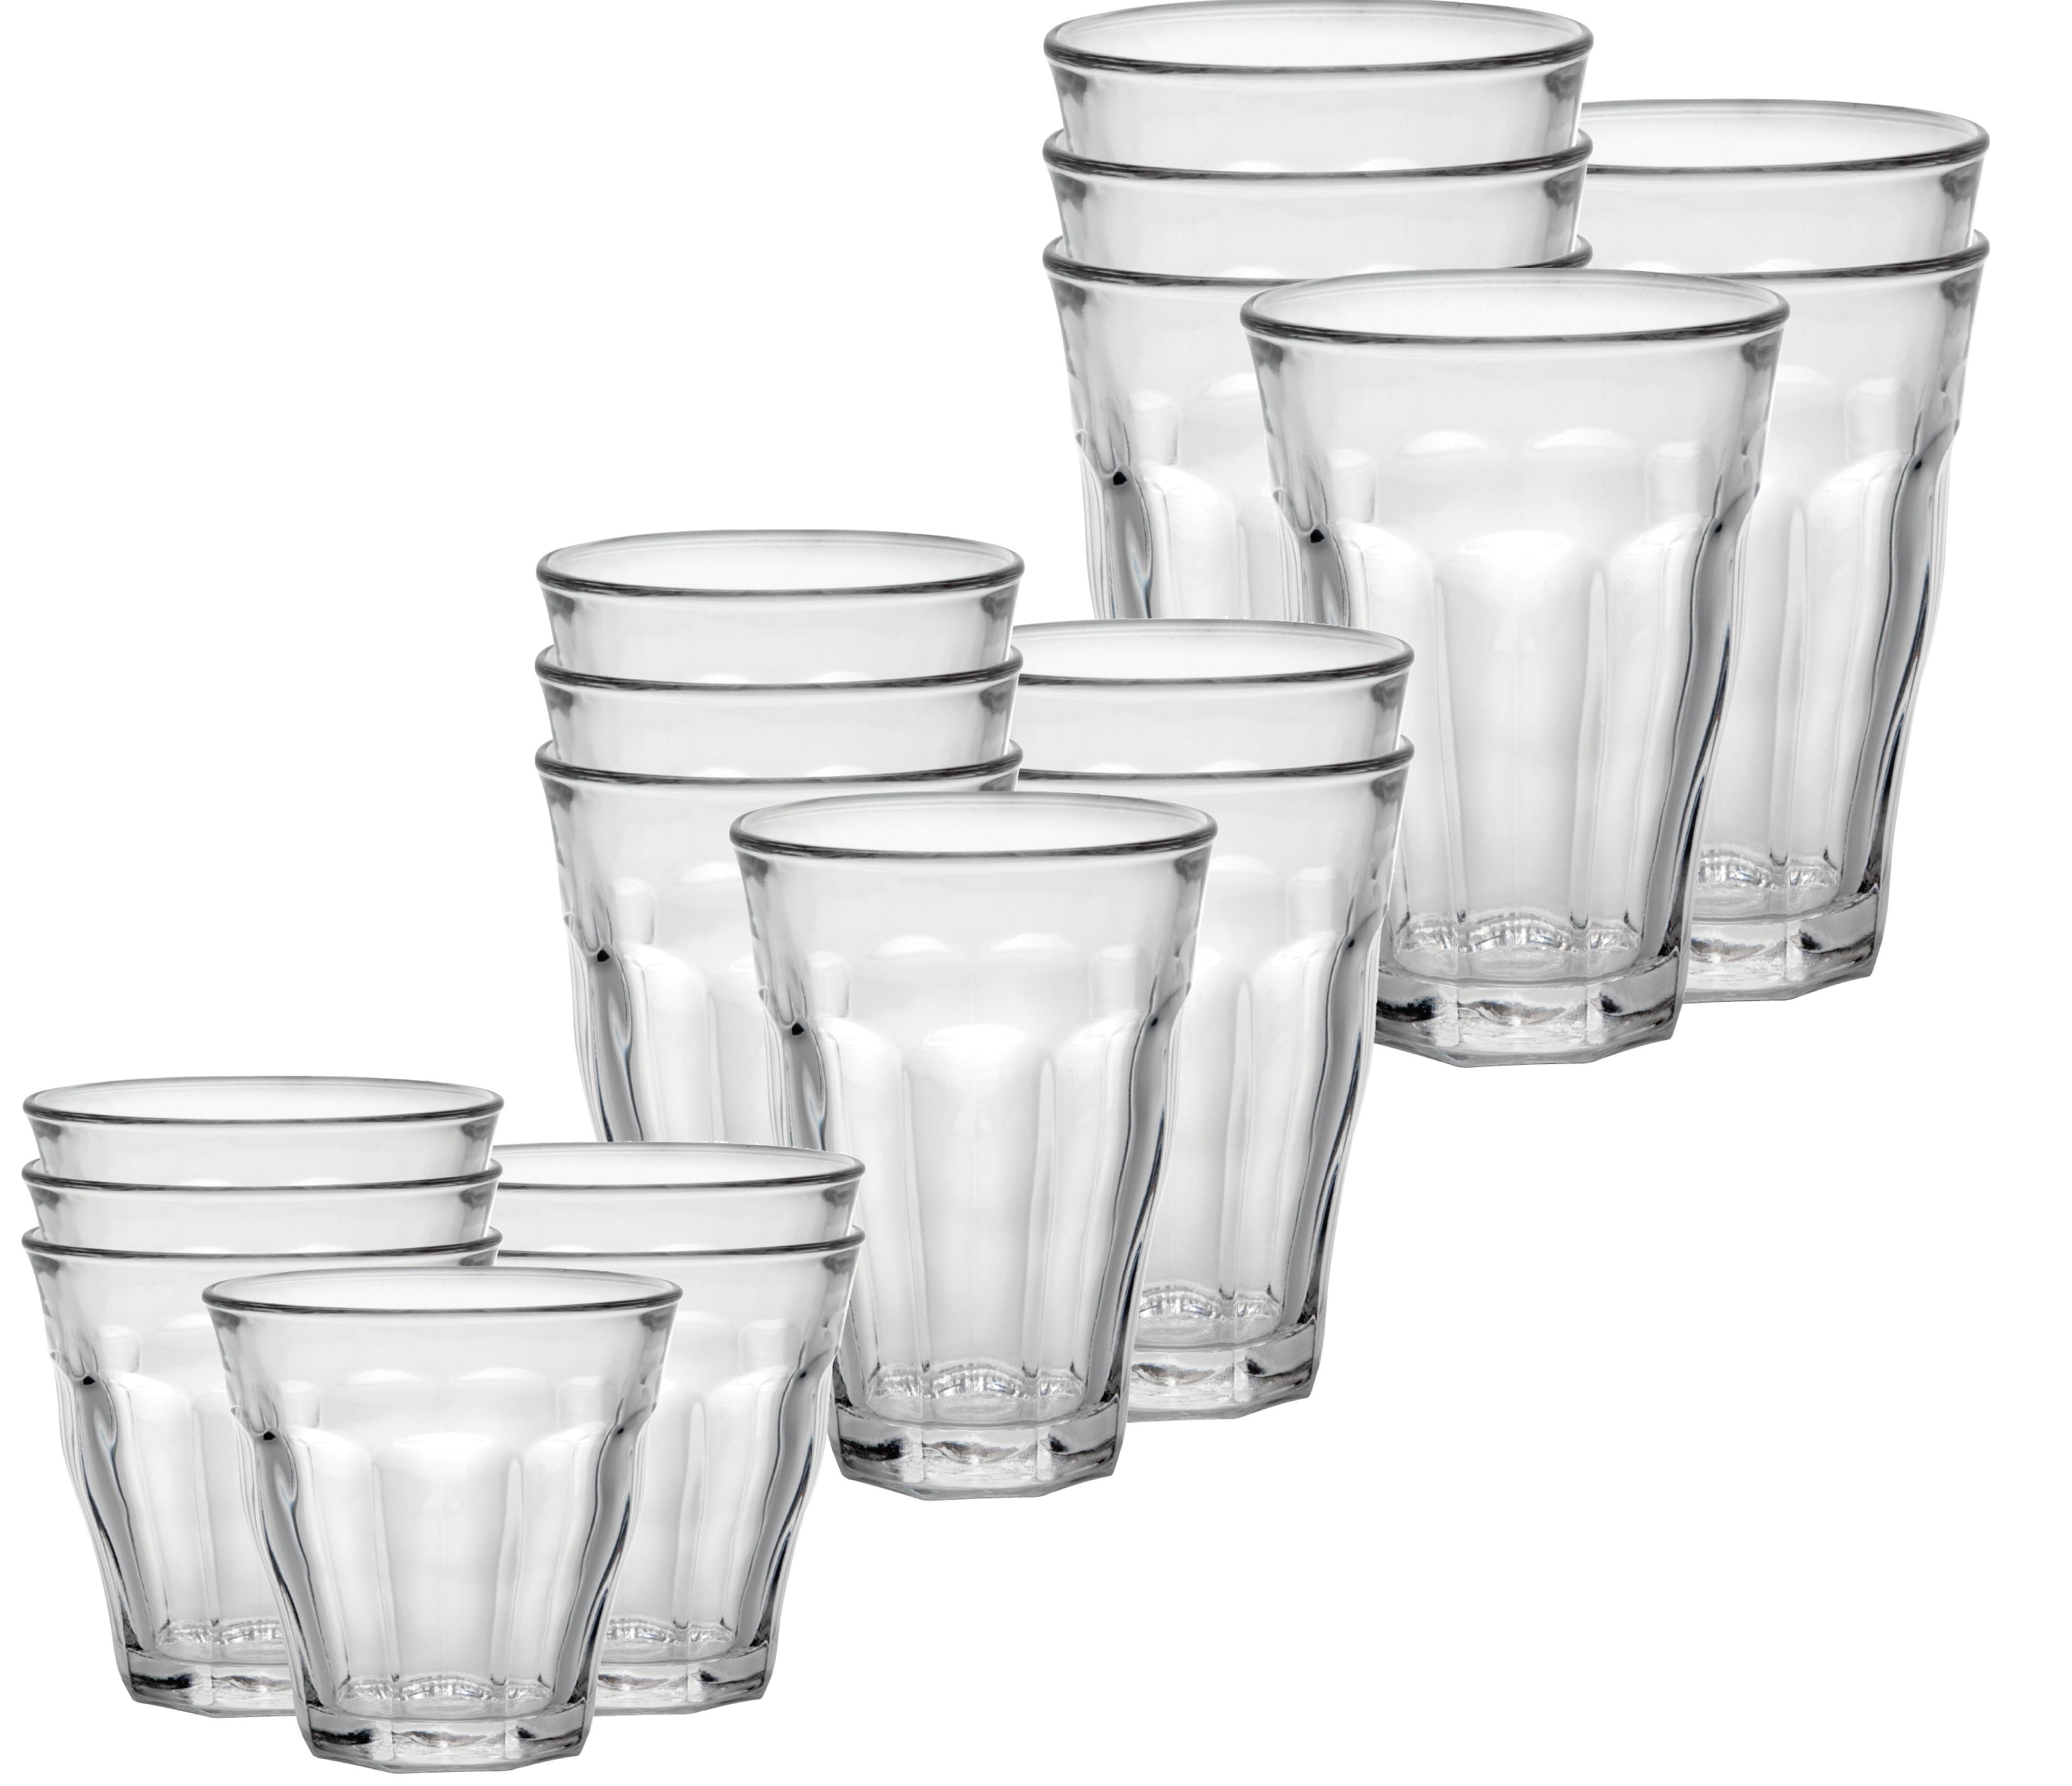 Stylish Drinking Glasses